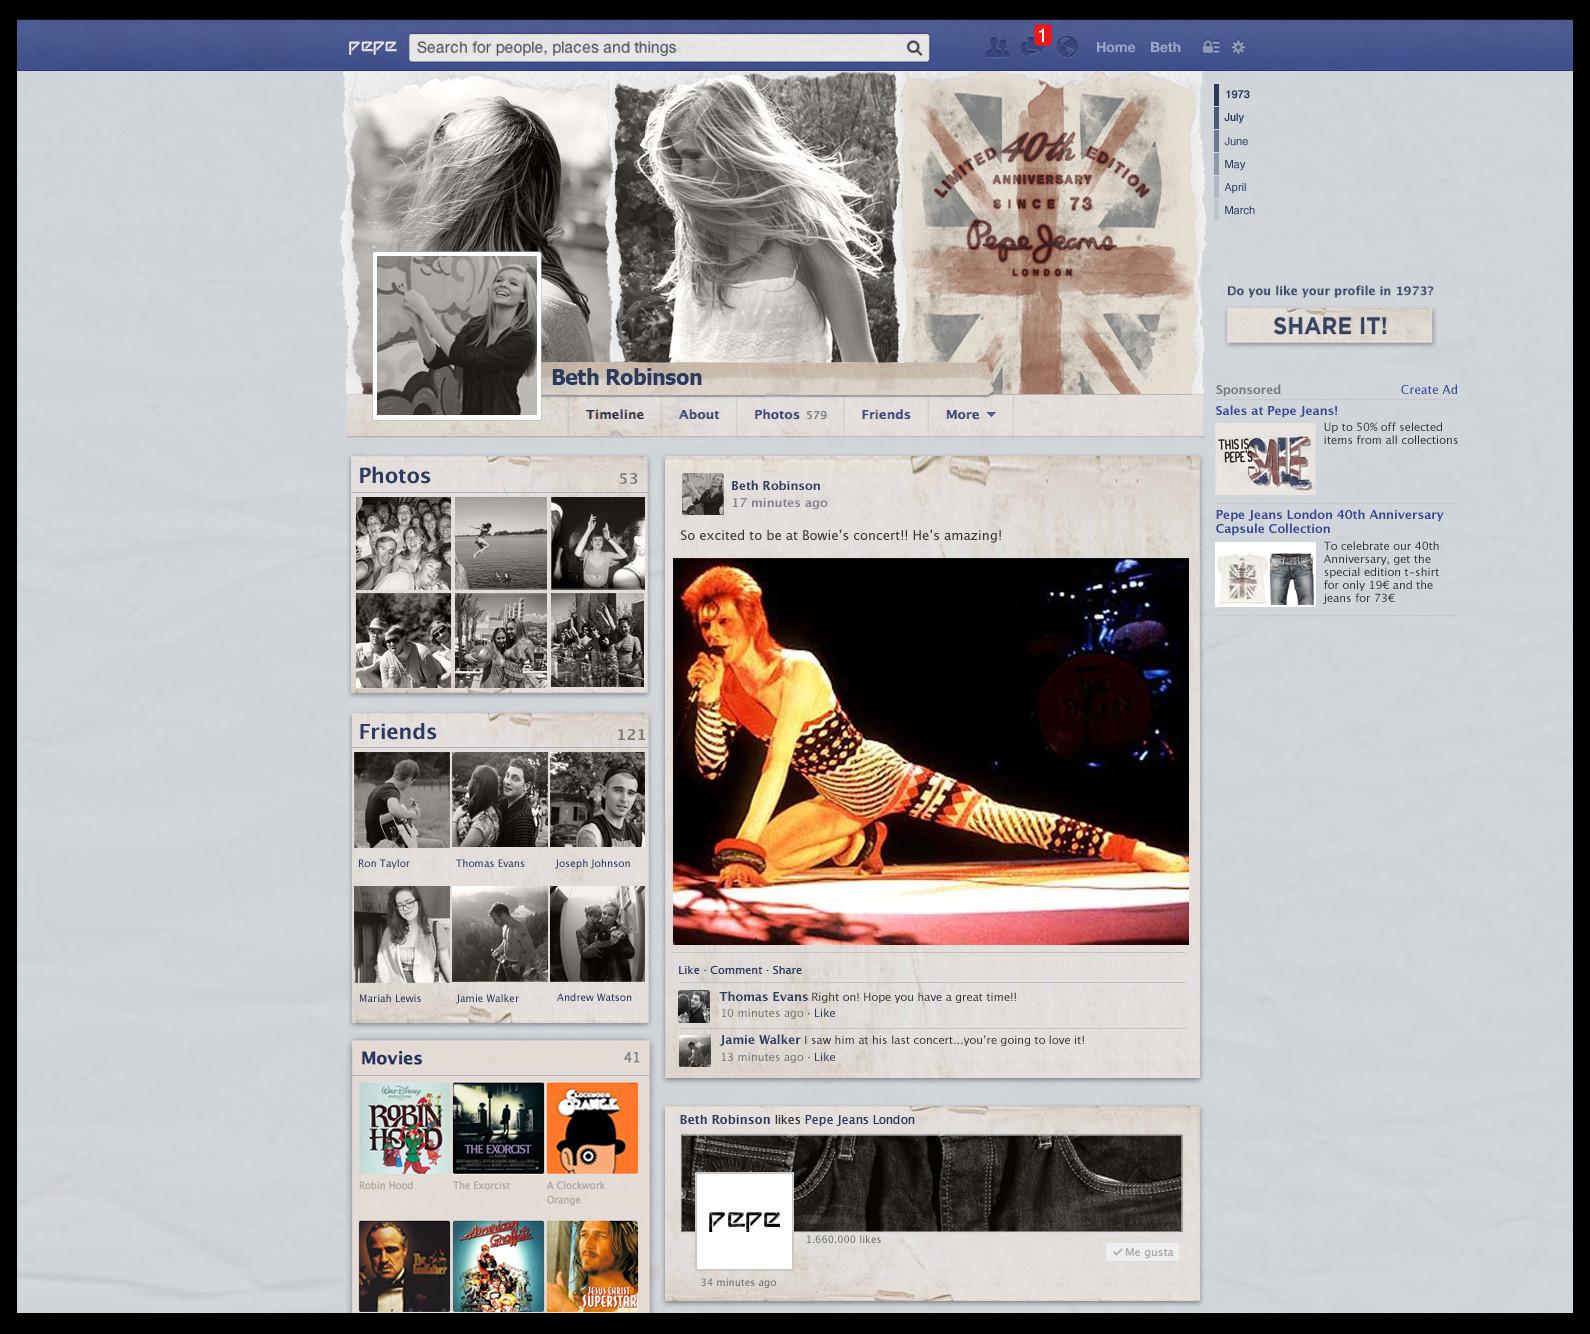 BMN_PEPE_fragmento mock up perfil Your FB in 1973.jpg